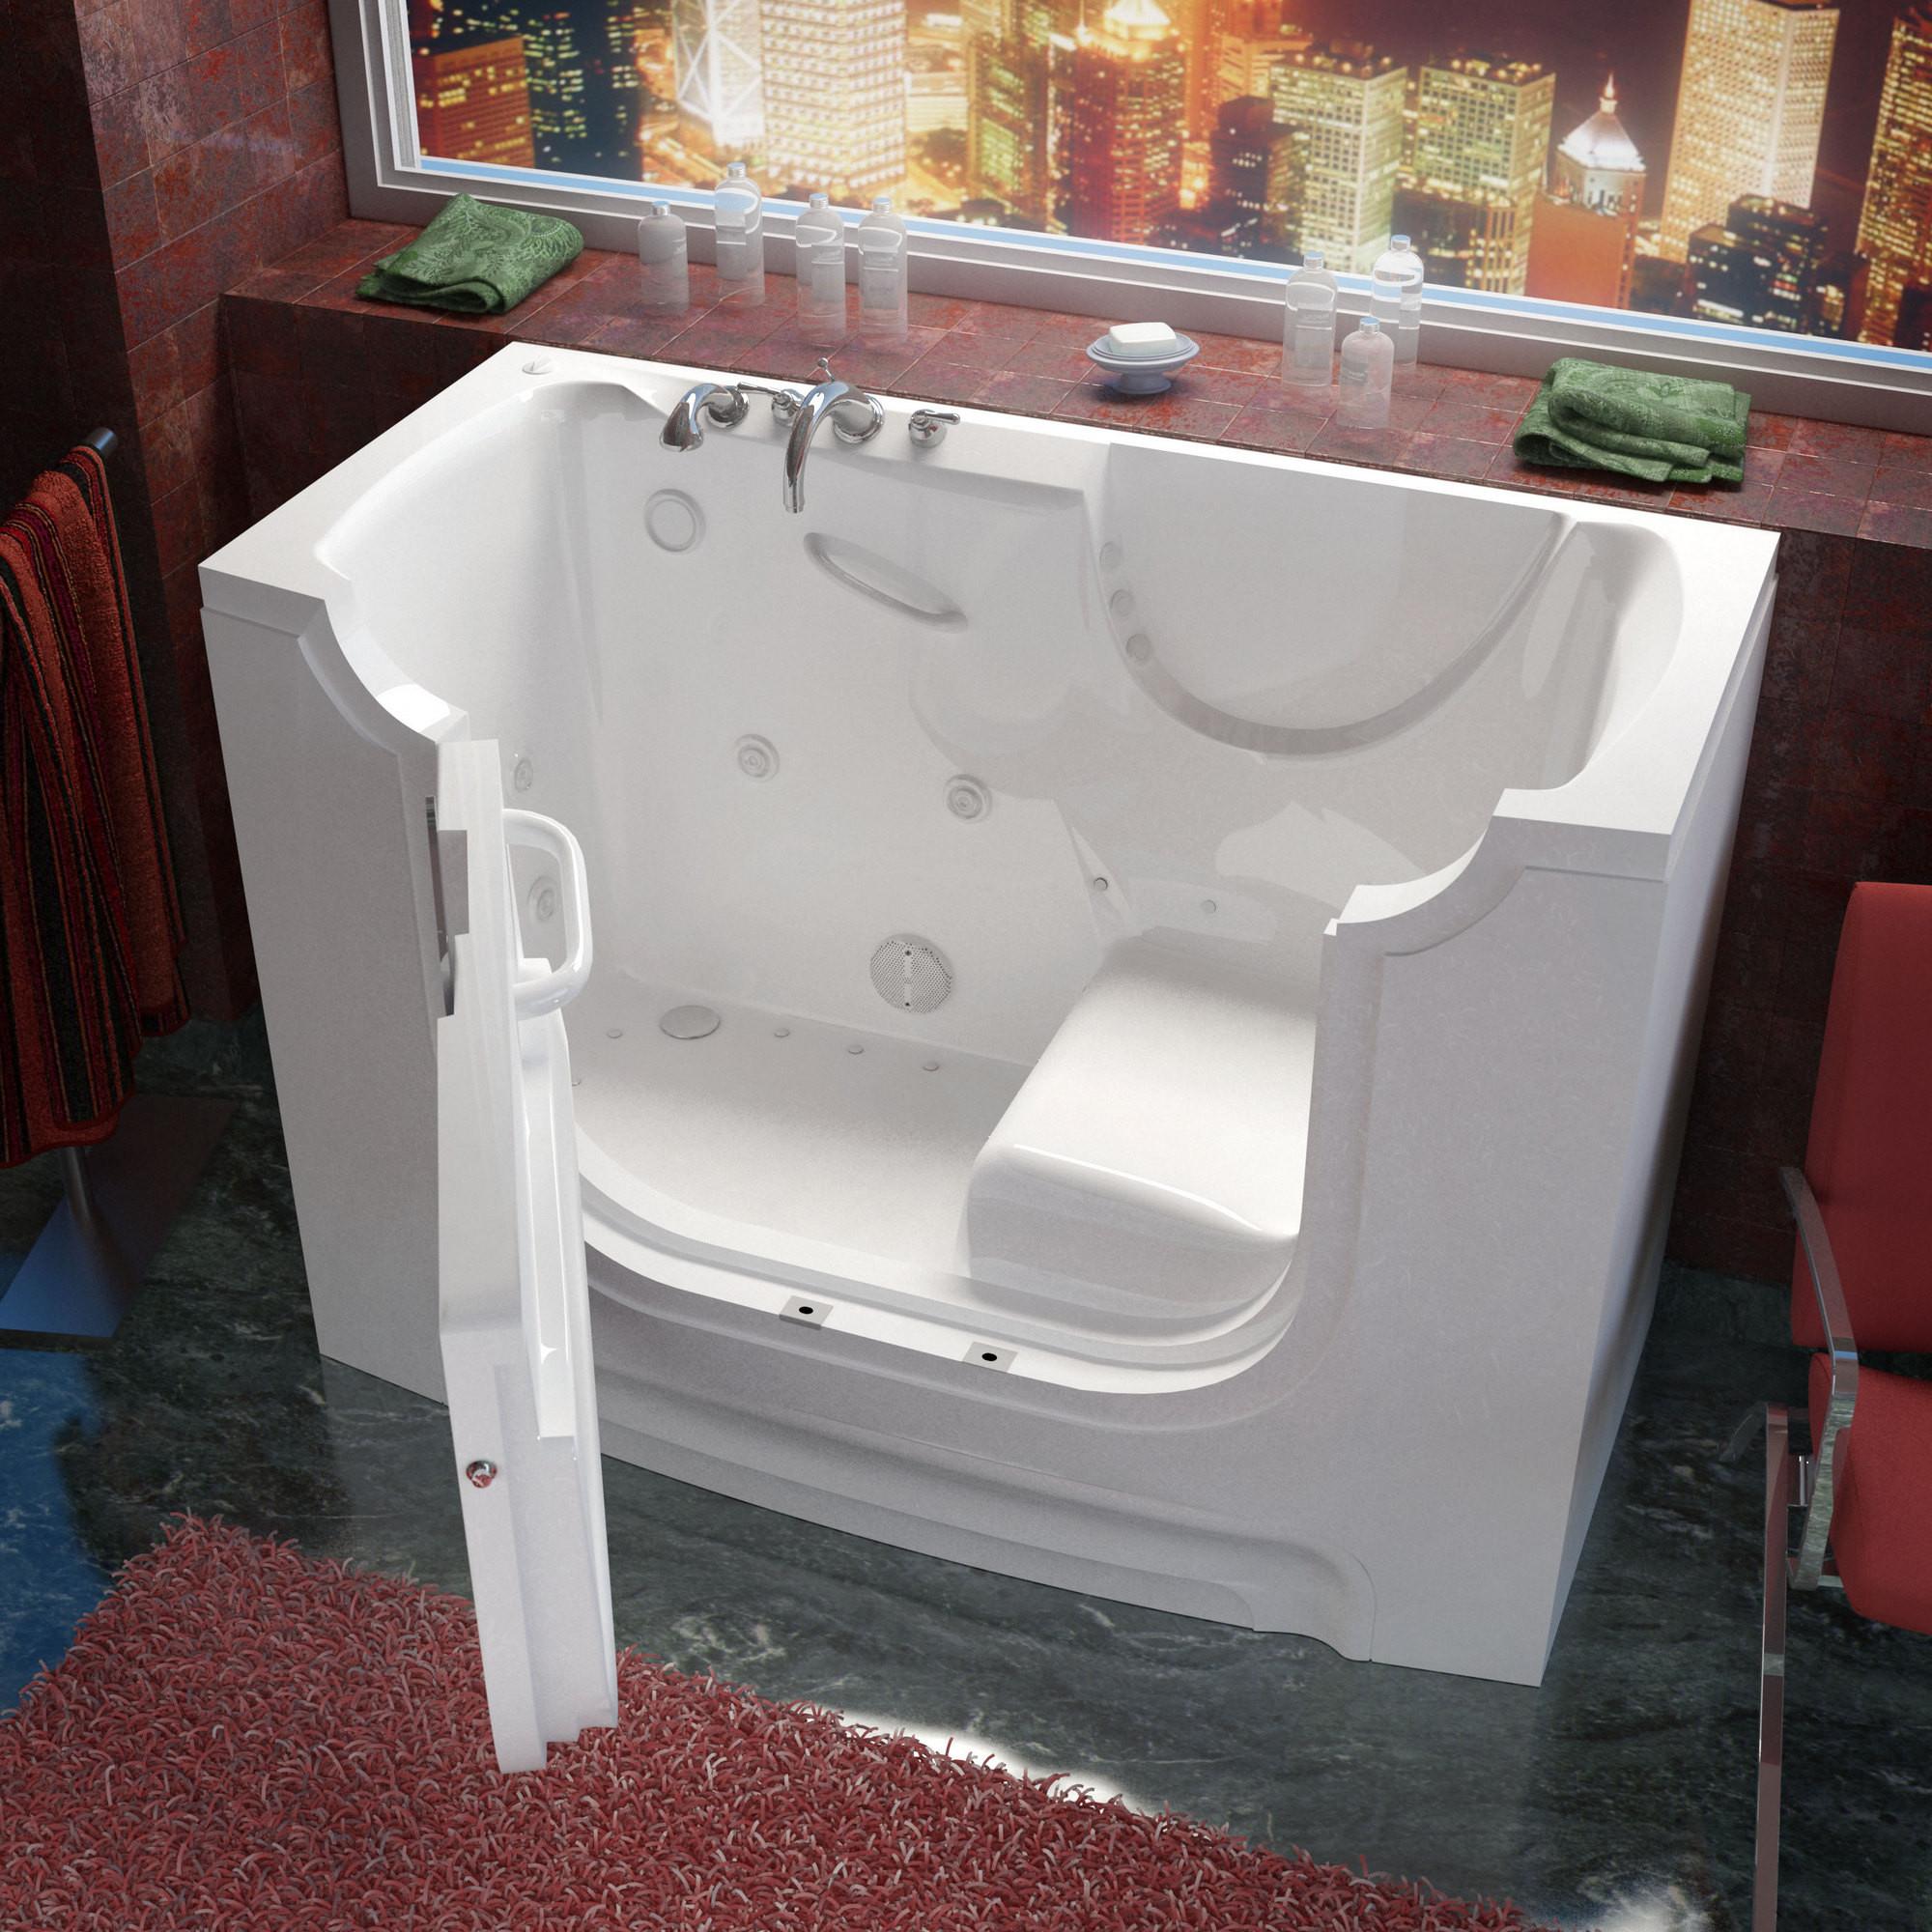 MediTub 3060WCALWD Wheel Chair Accessible Whirlpool & Air Jetted Bathtub